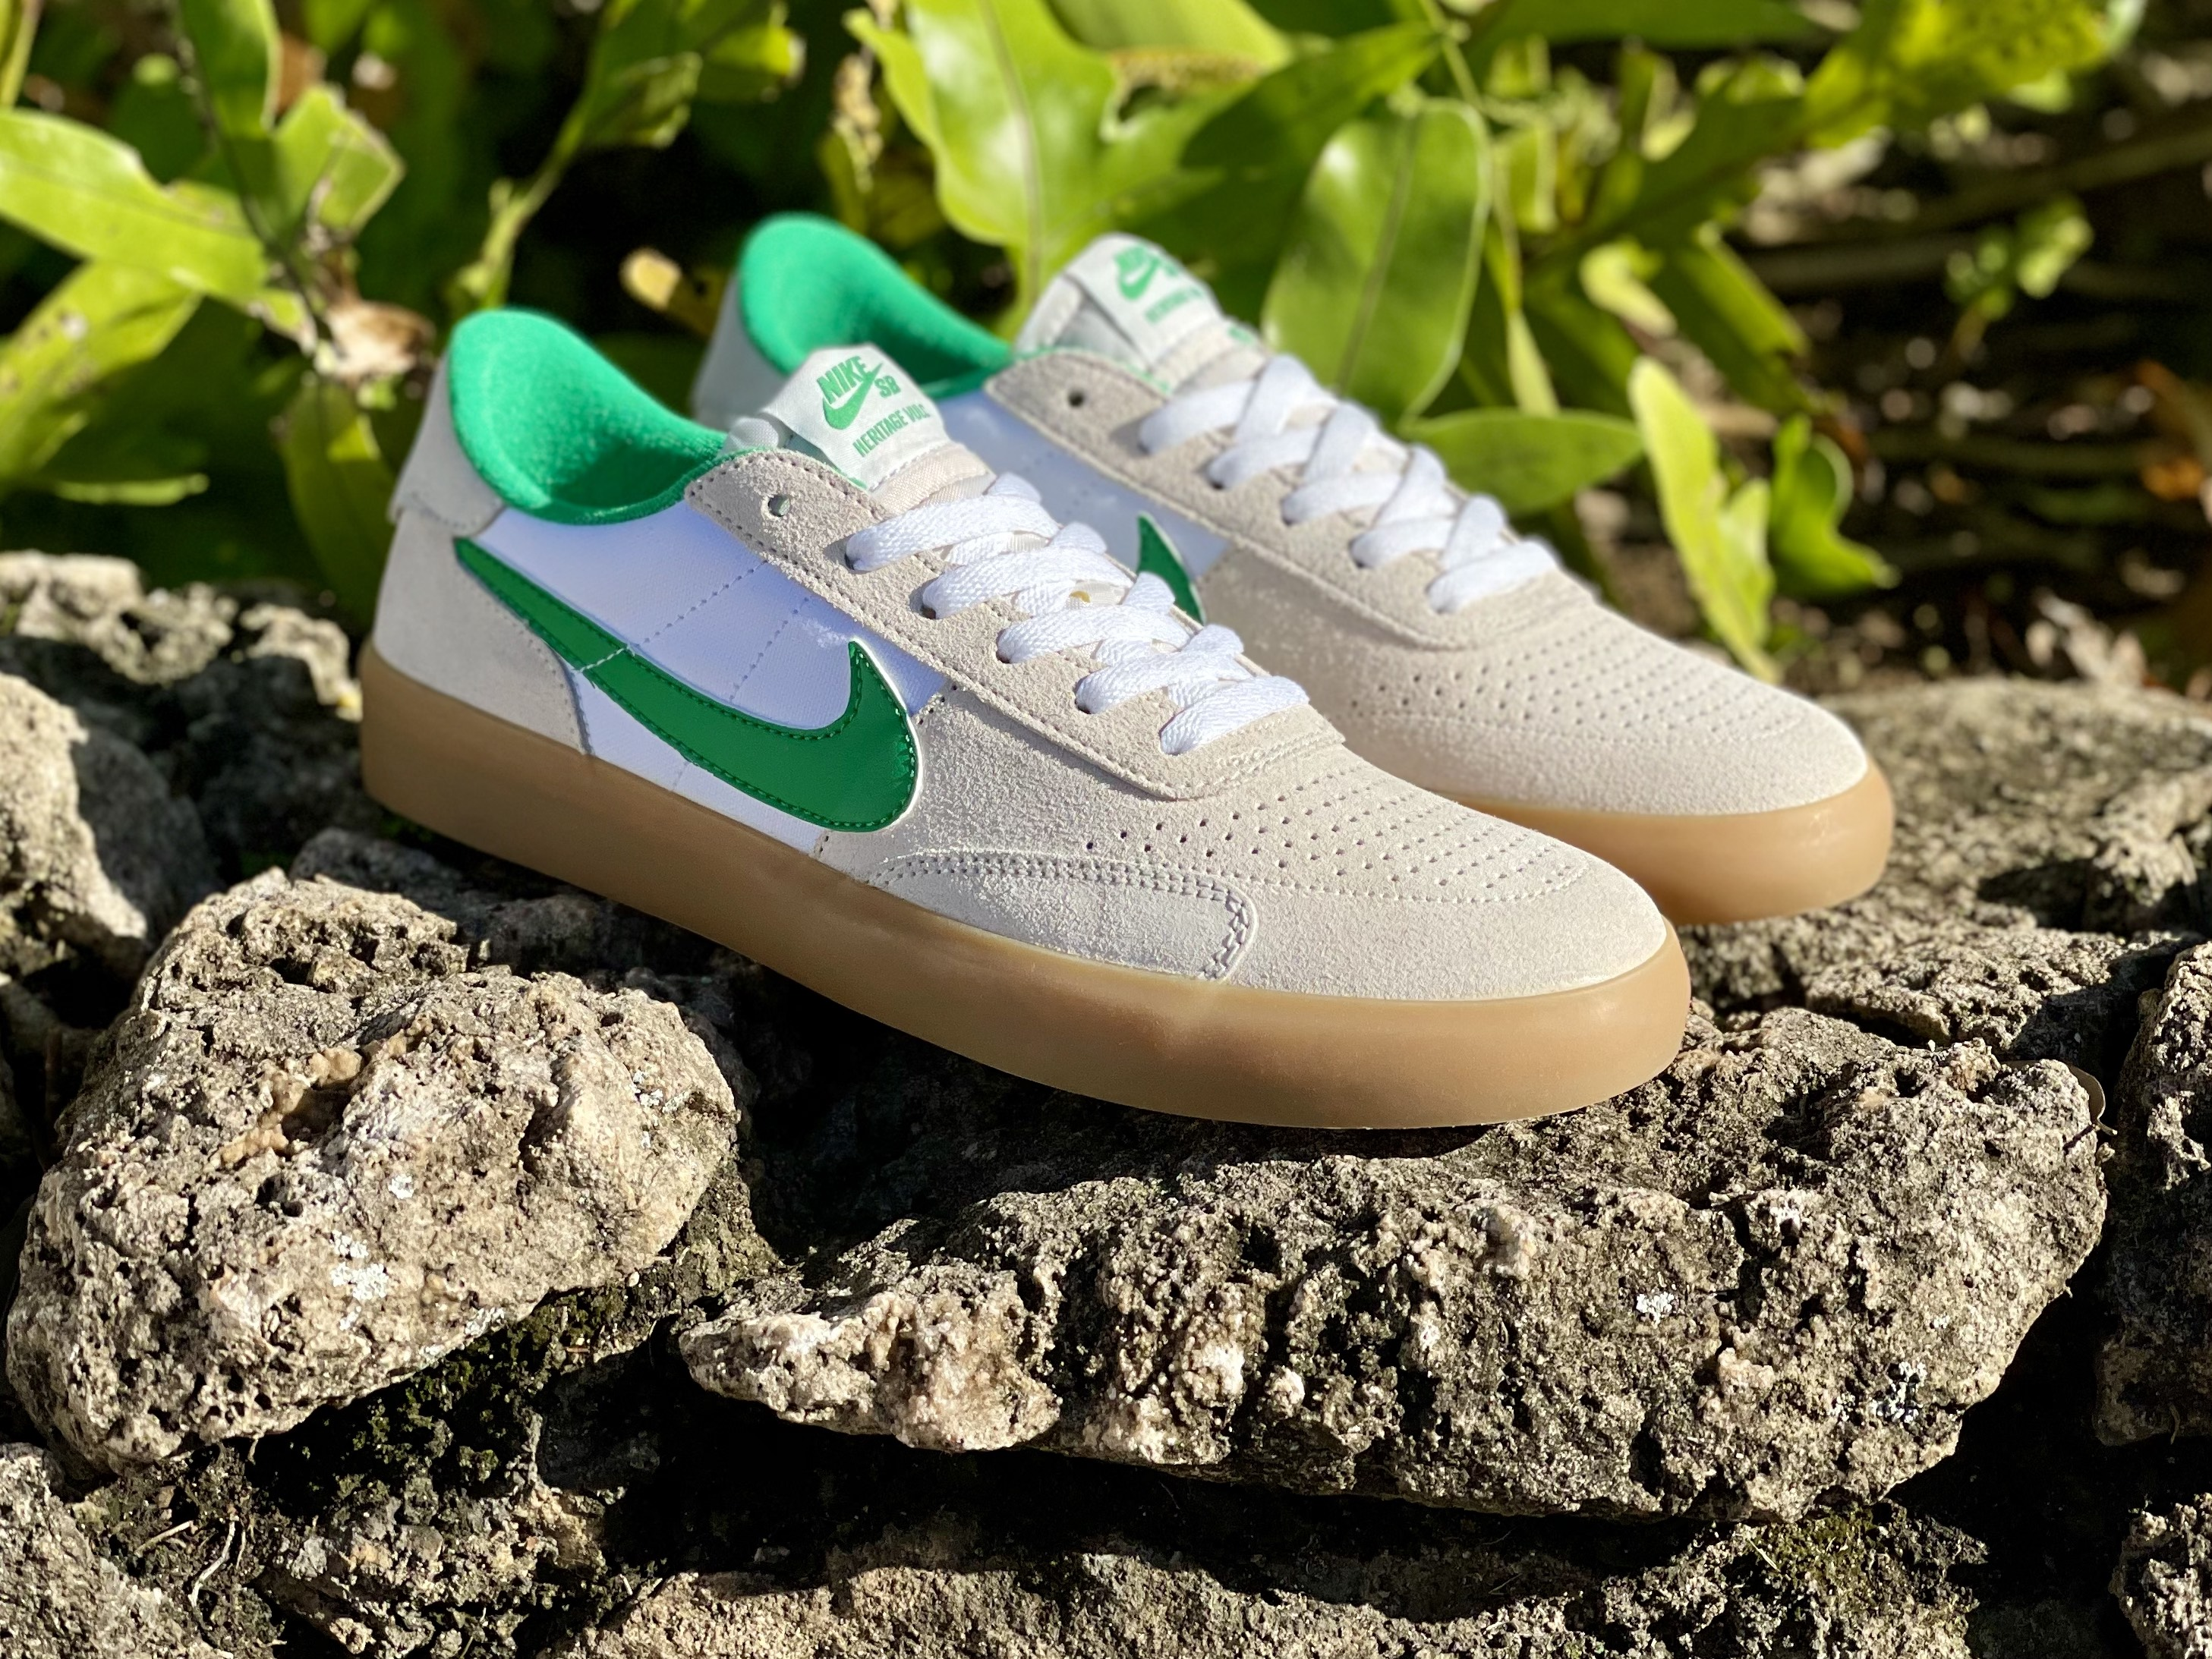 Nike SB. Heritage Vulc. Summit White/White/Gum/Light Brown/Lucky Green.